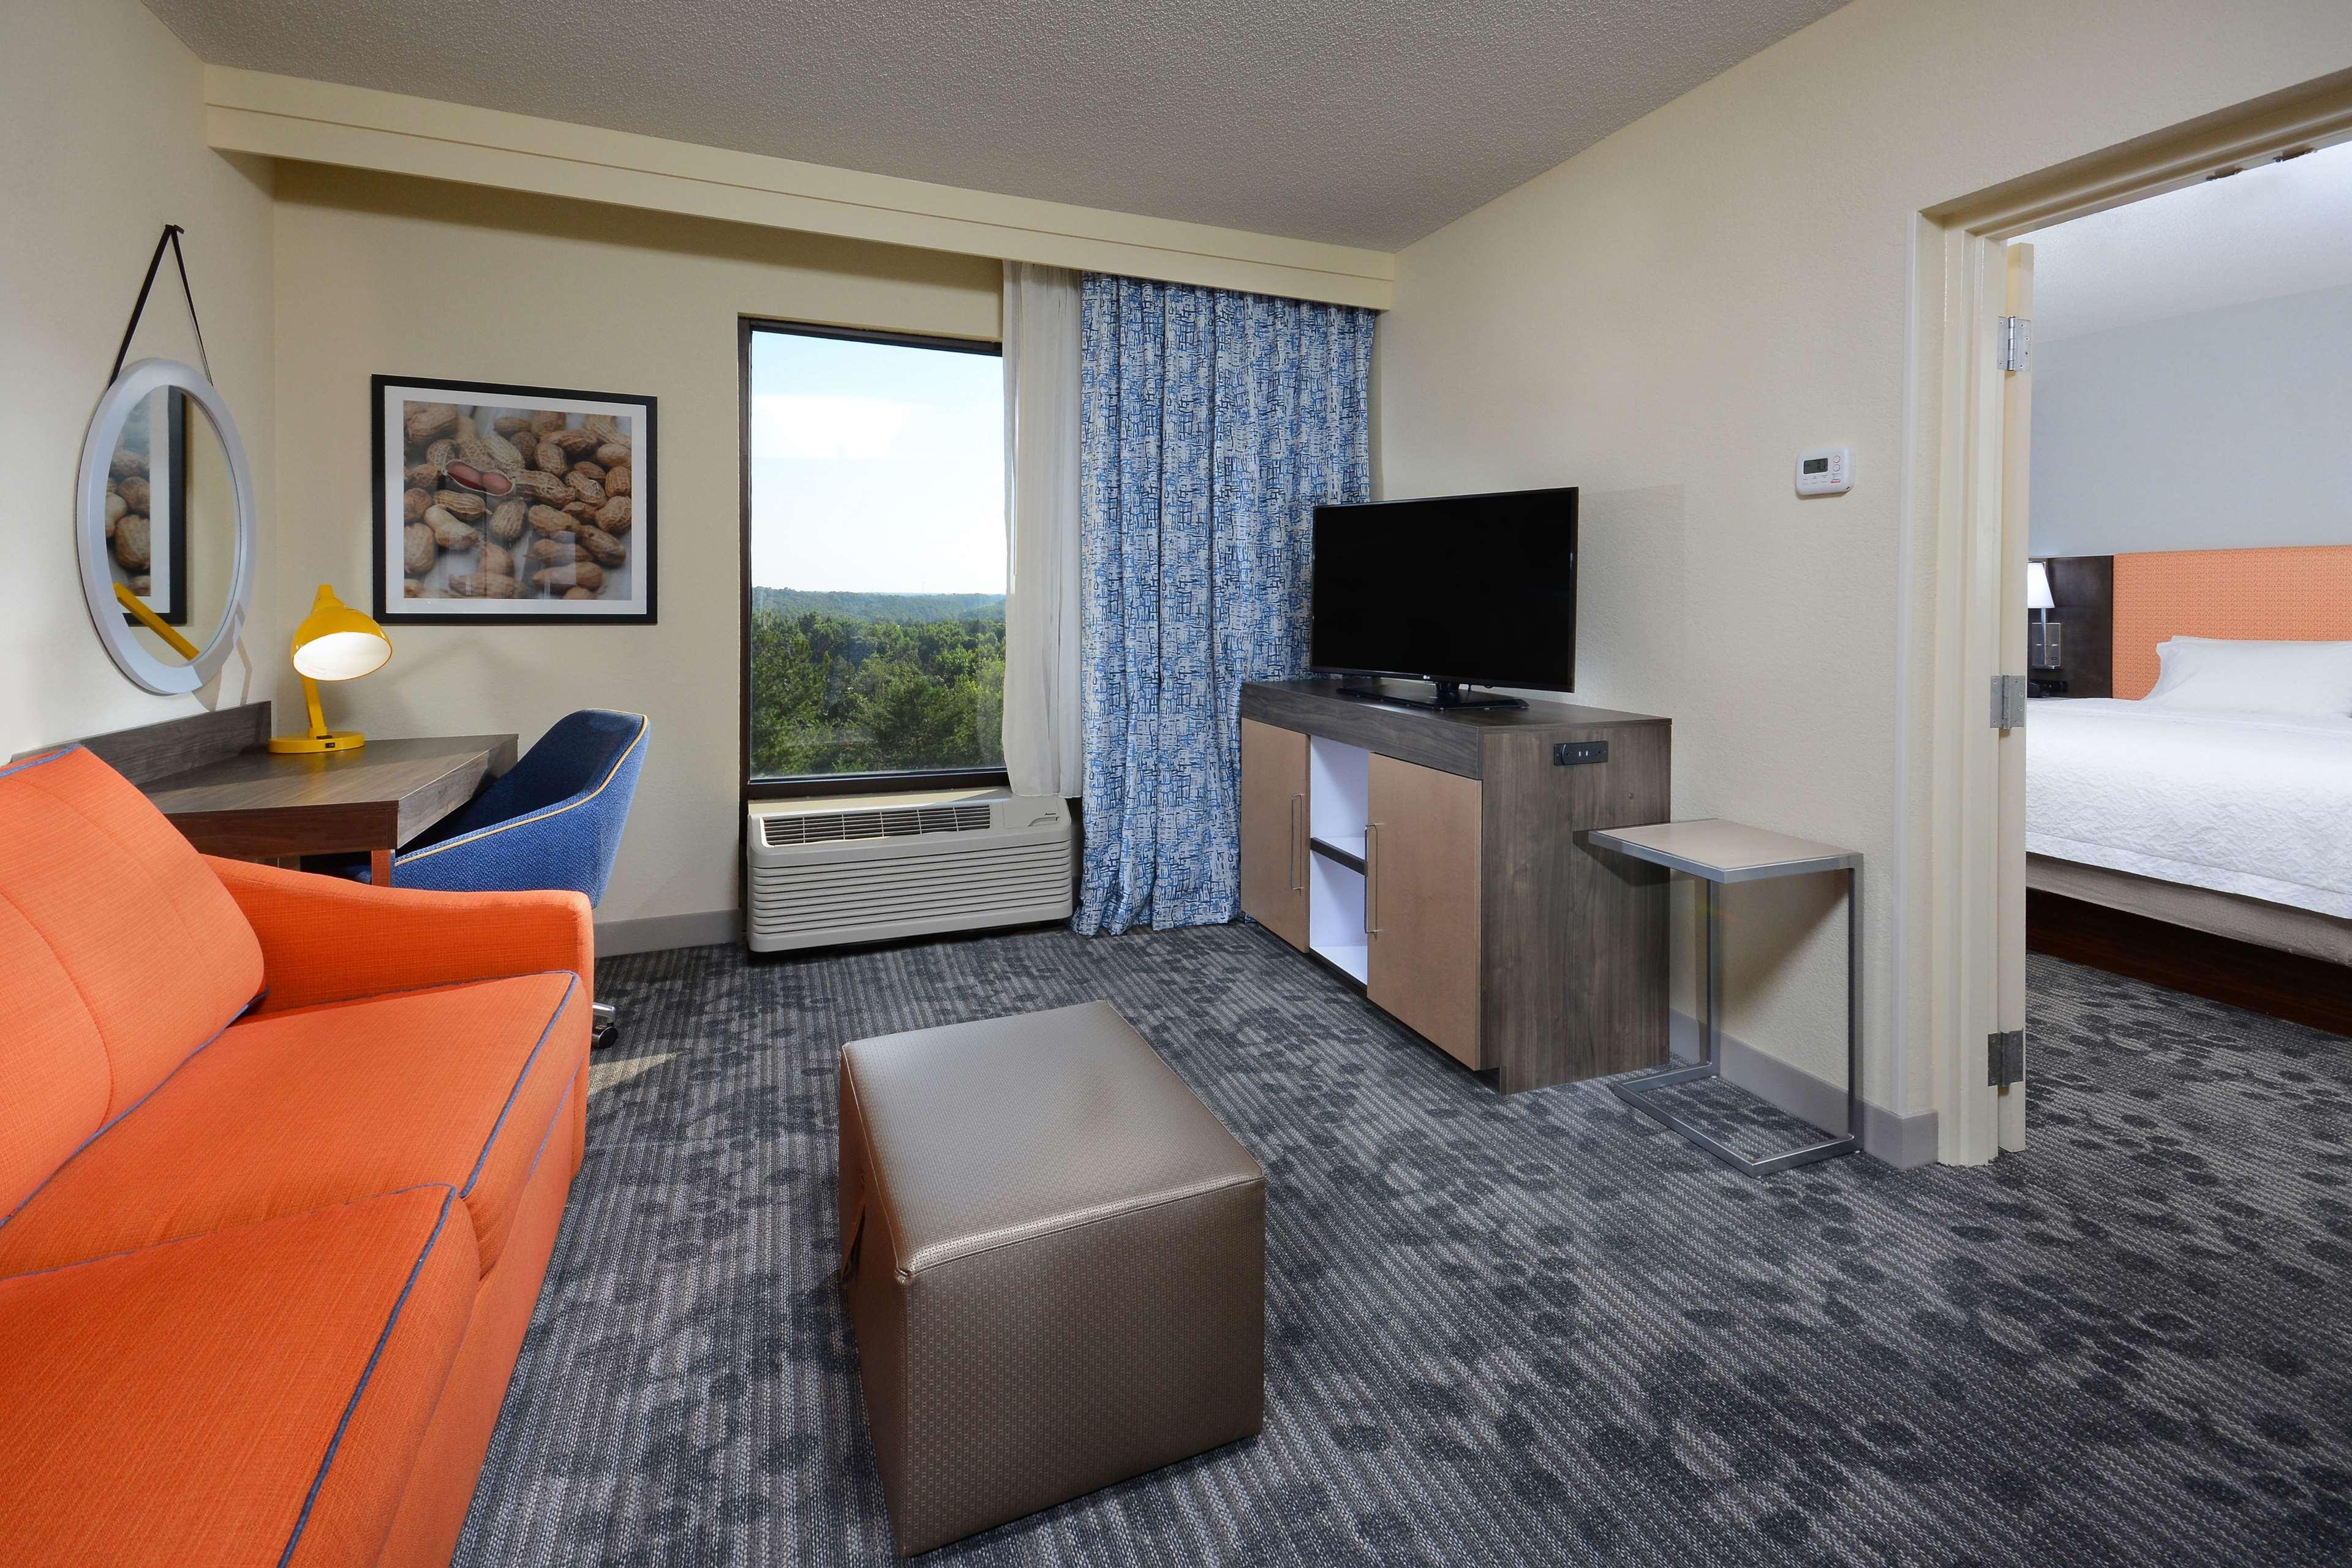 Hampton Inn & Suites Greenville/Spartanburg I-85 image 28